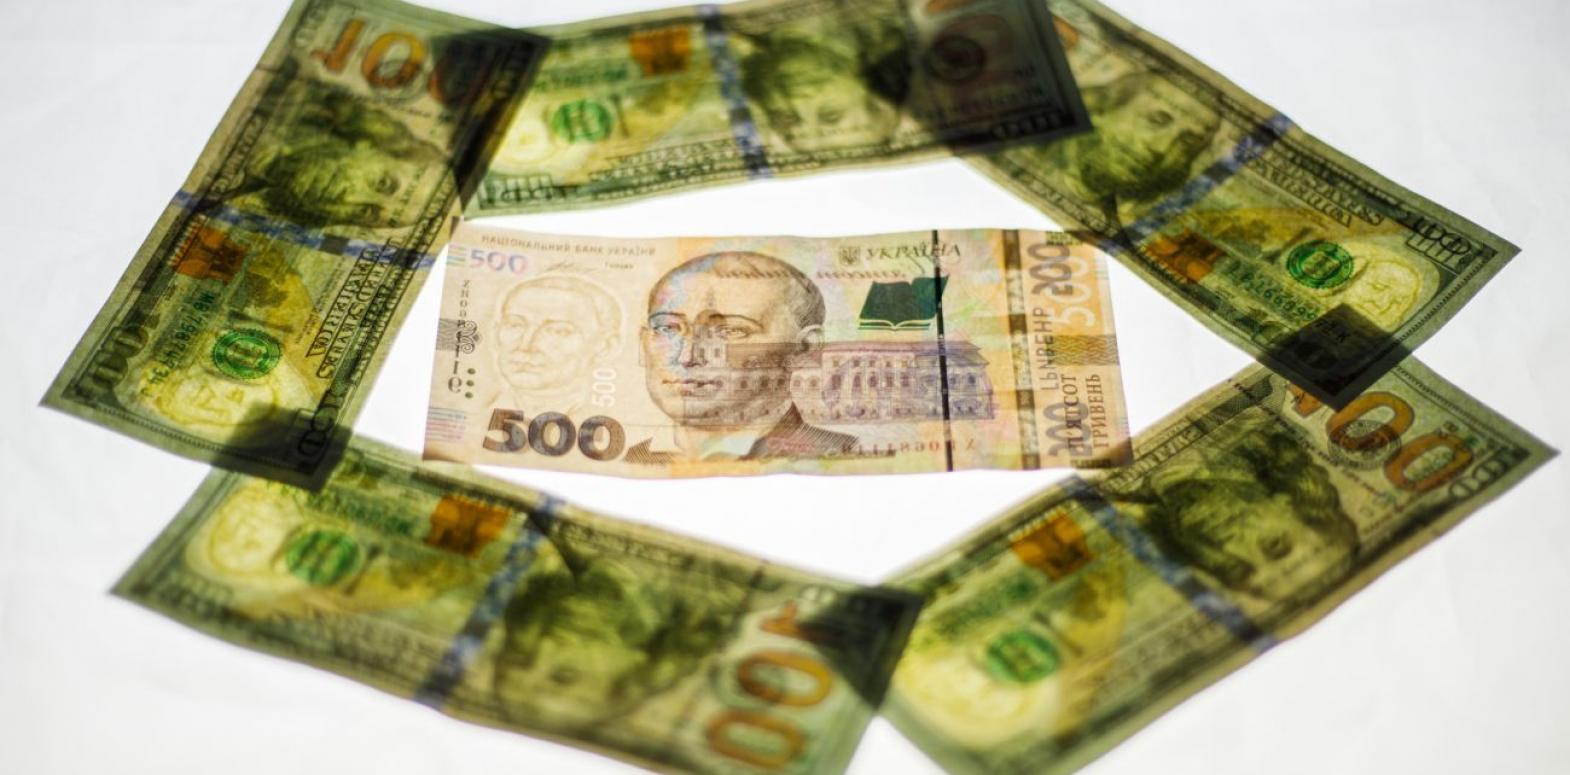 На межбанке наметился разворот тренда: курс доллара снижается